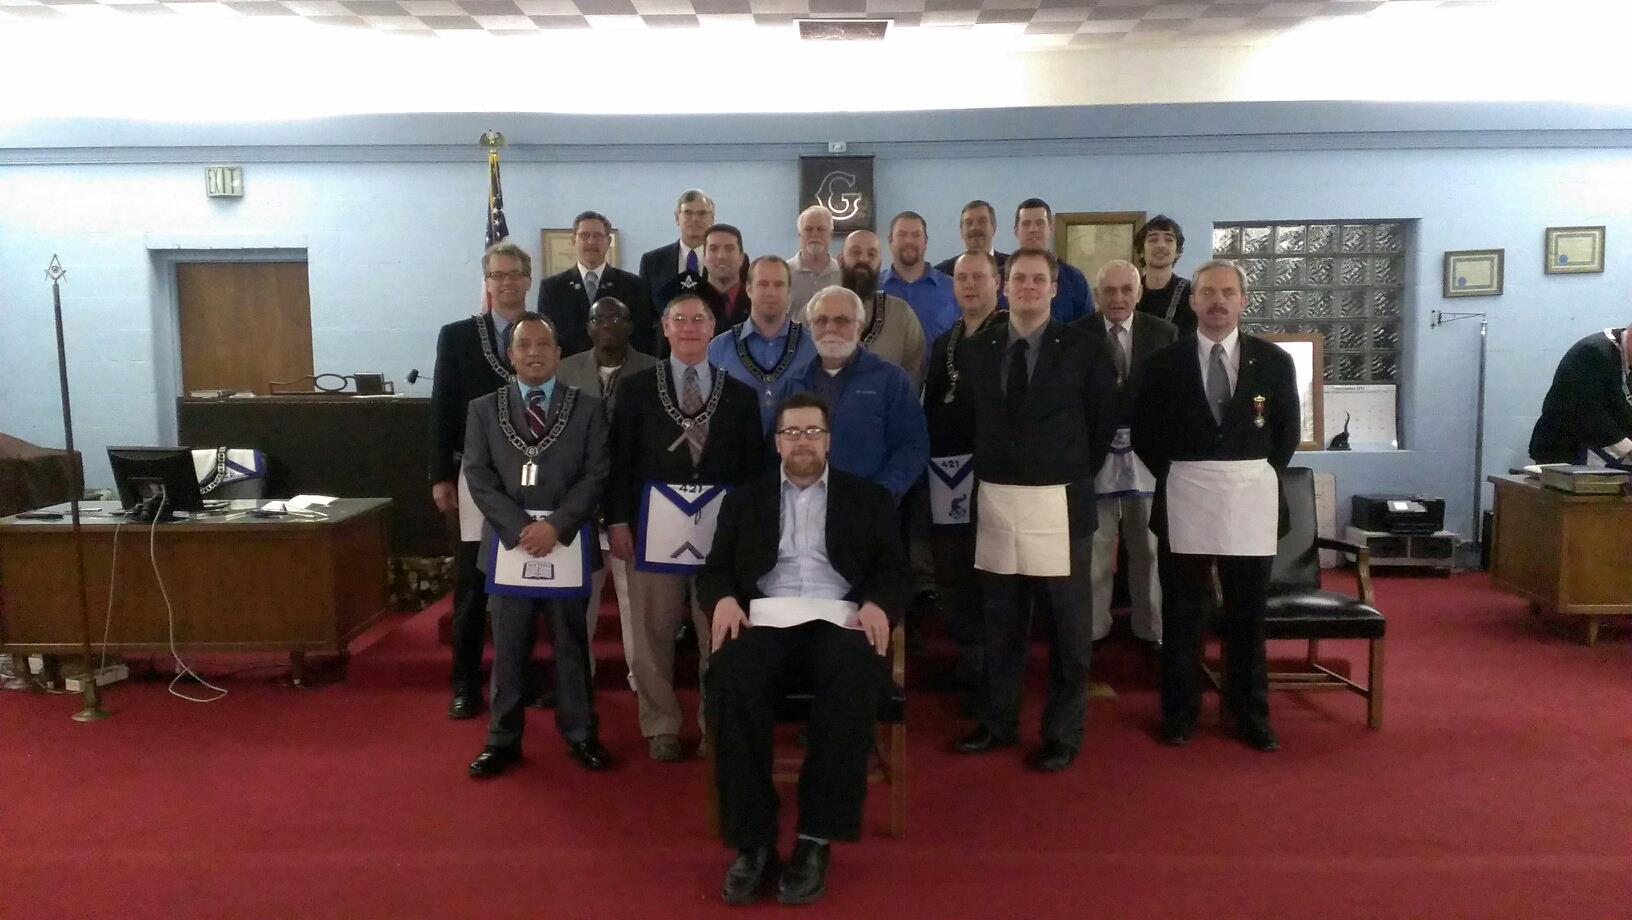 New Master Mason tonight, plus Brother Matt wearing an apron from 1932! - Carmel Masonic Lodge ...